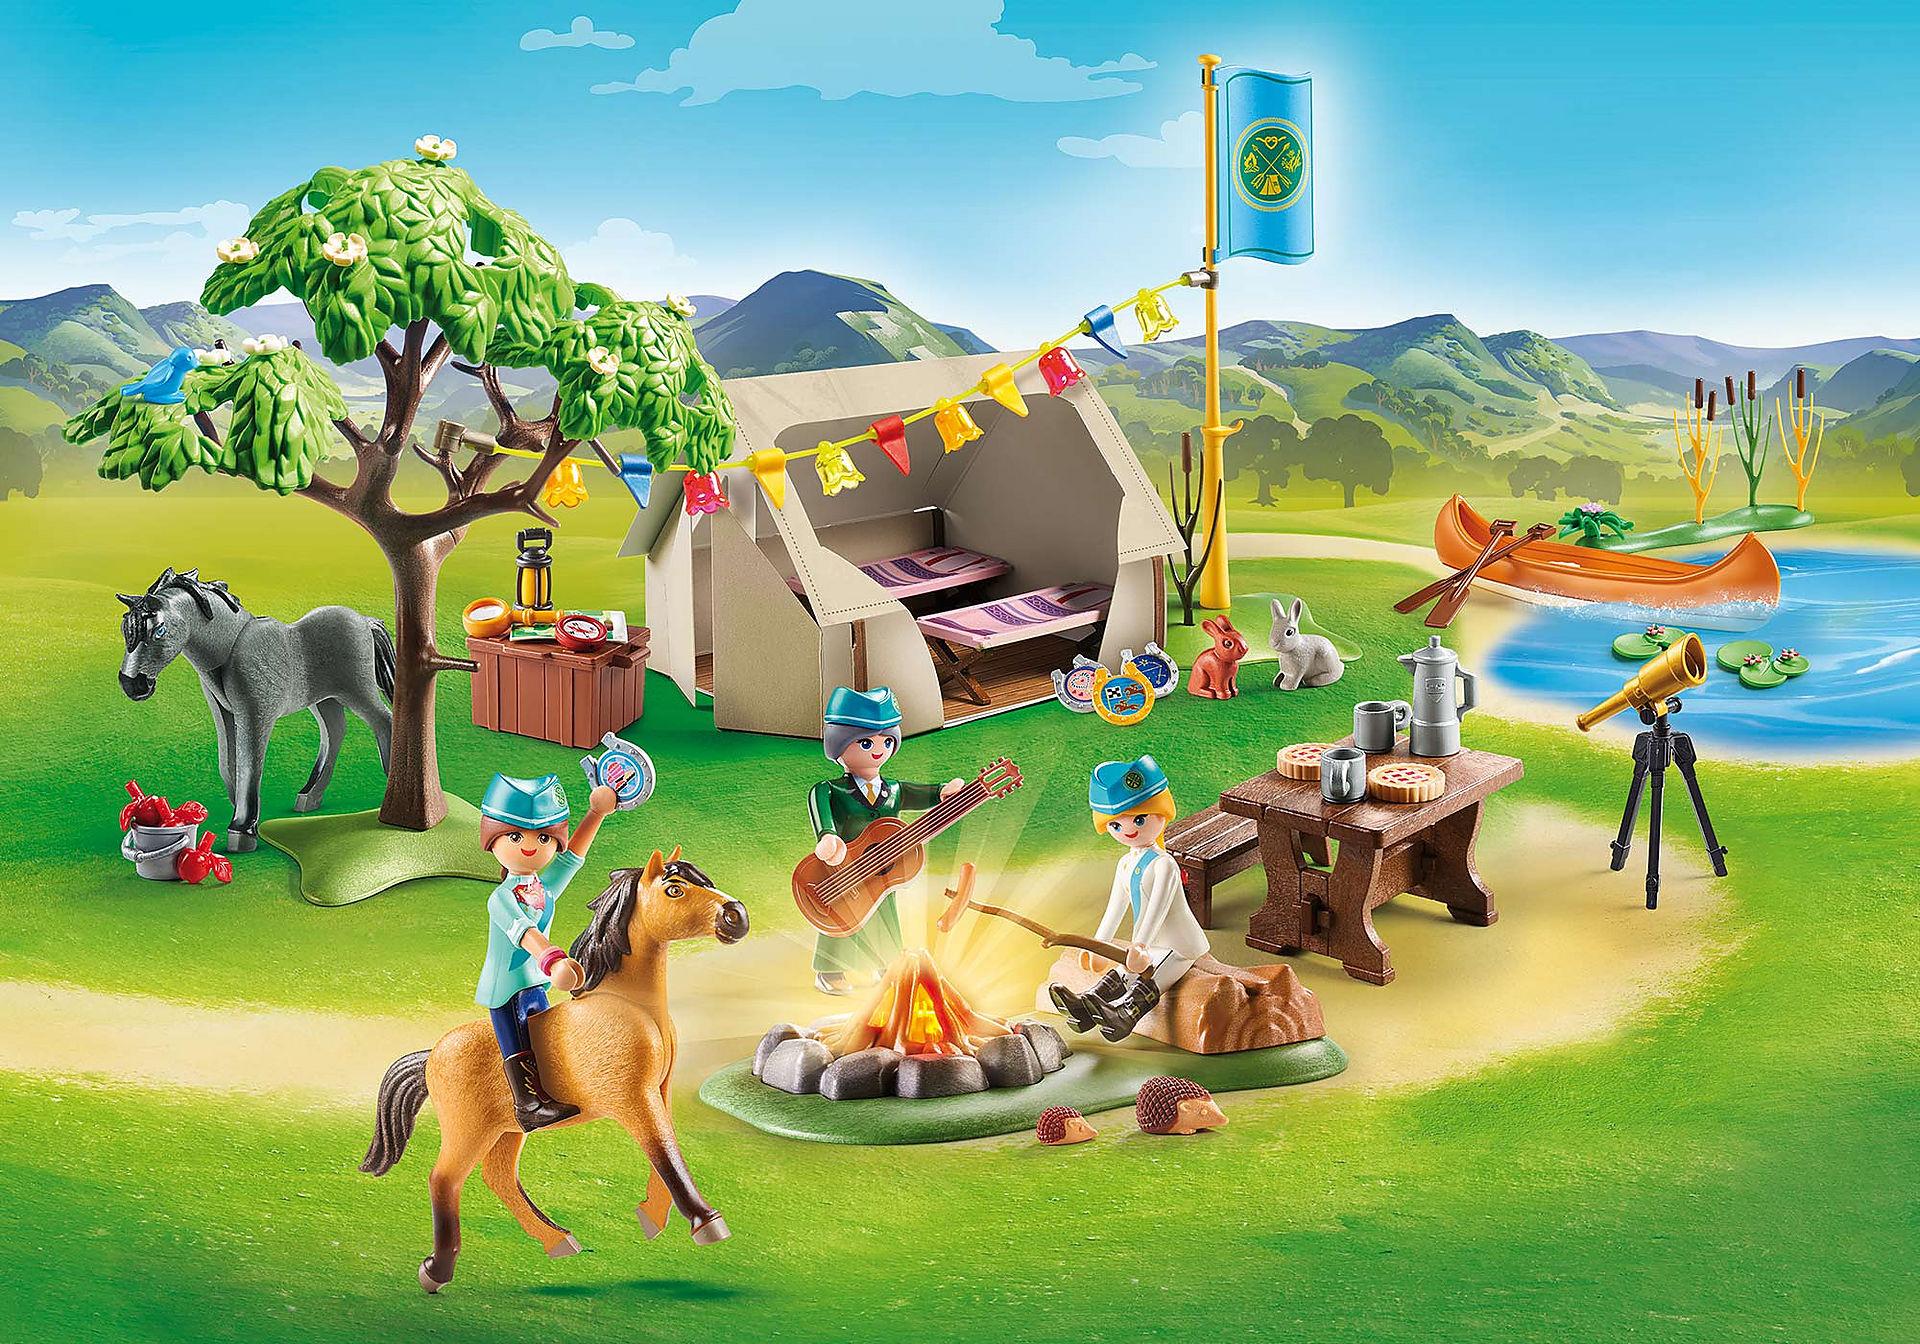 70329 Camps de vacances zoom image1